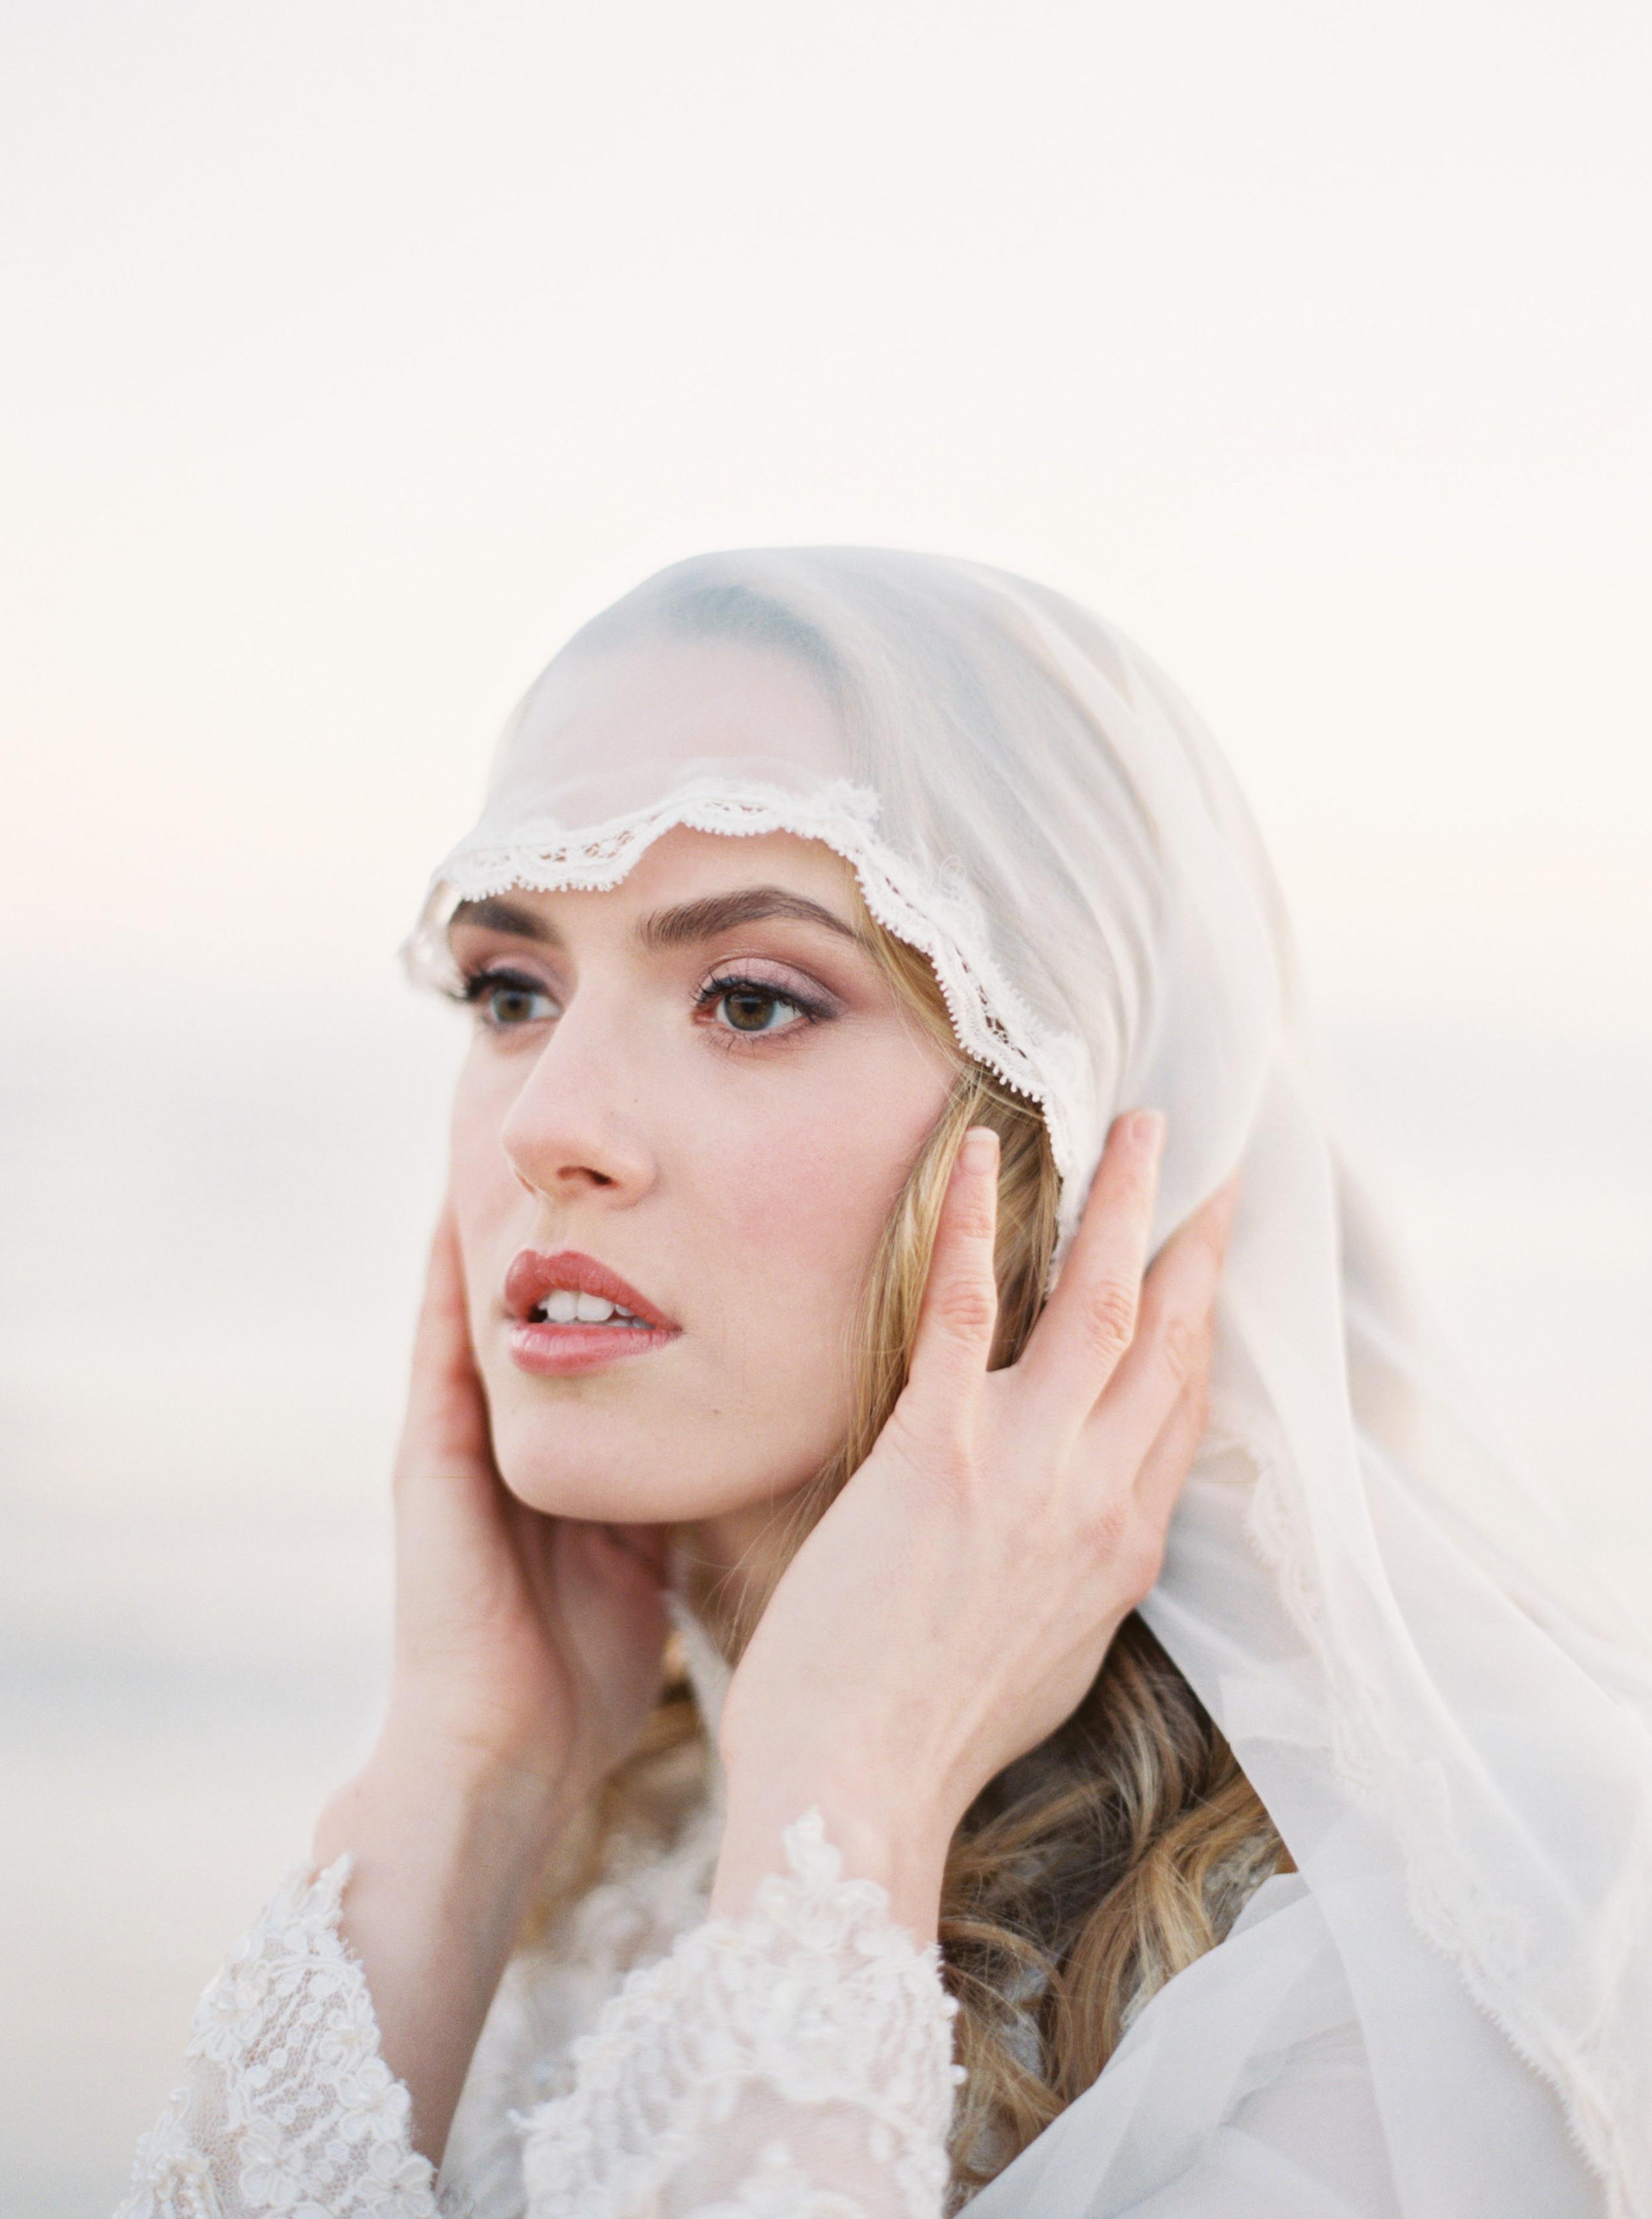 Kyle John l Fine Art Wedding Photography l Chicago, Copenhagen, California, New York, Destination l Blog l Sea and Sand_18